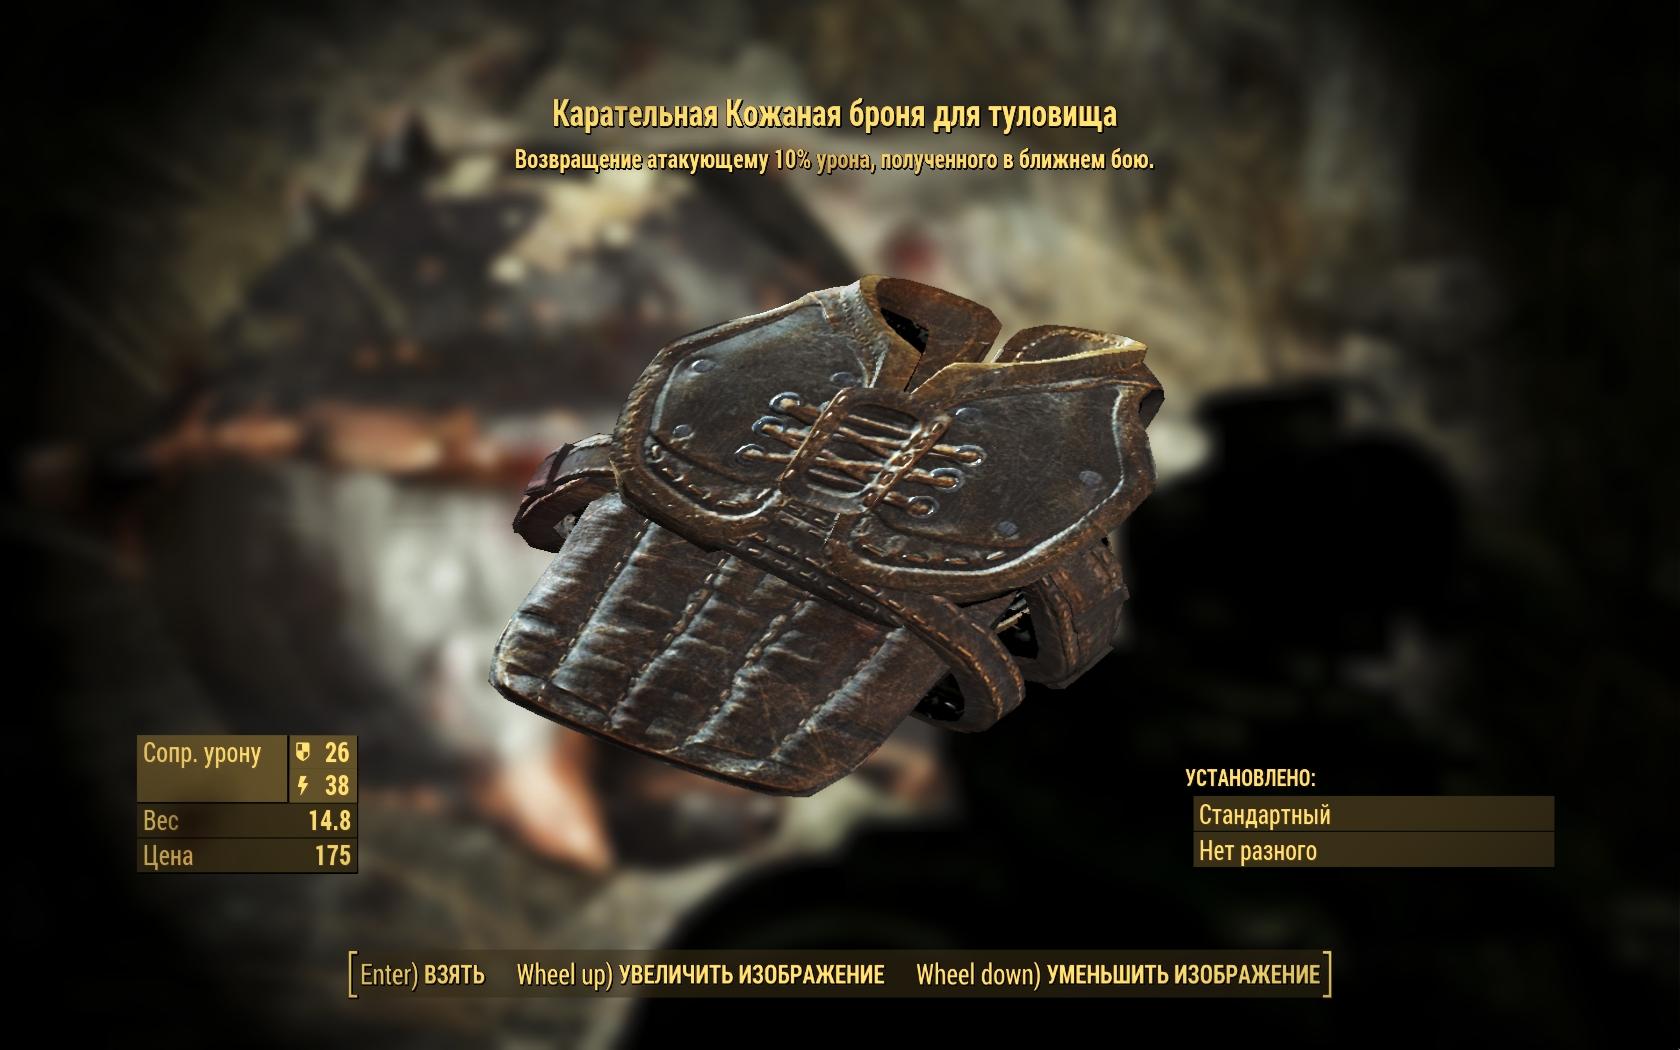 Карательная кожаная броня для туловища - Fallout 4 броня, Карательная, кожаная, Одежда